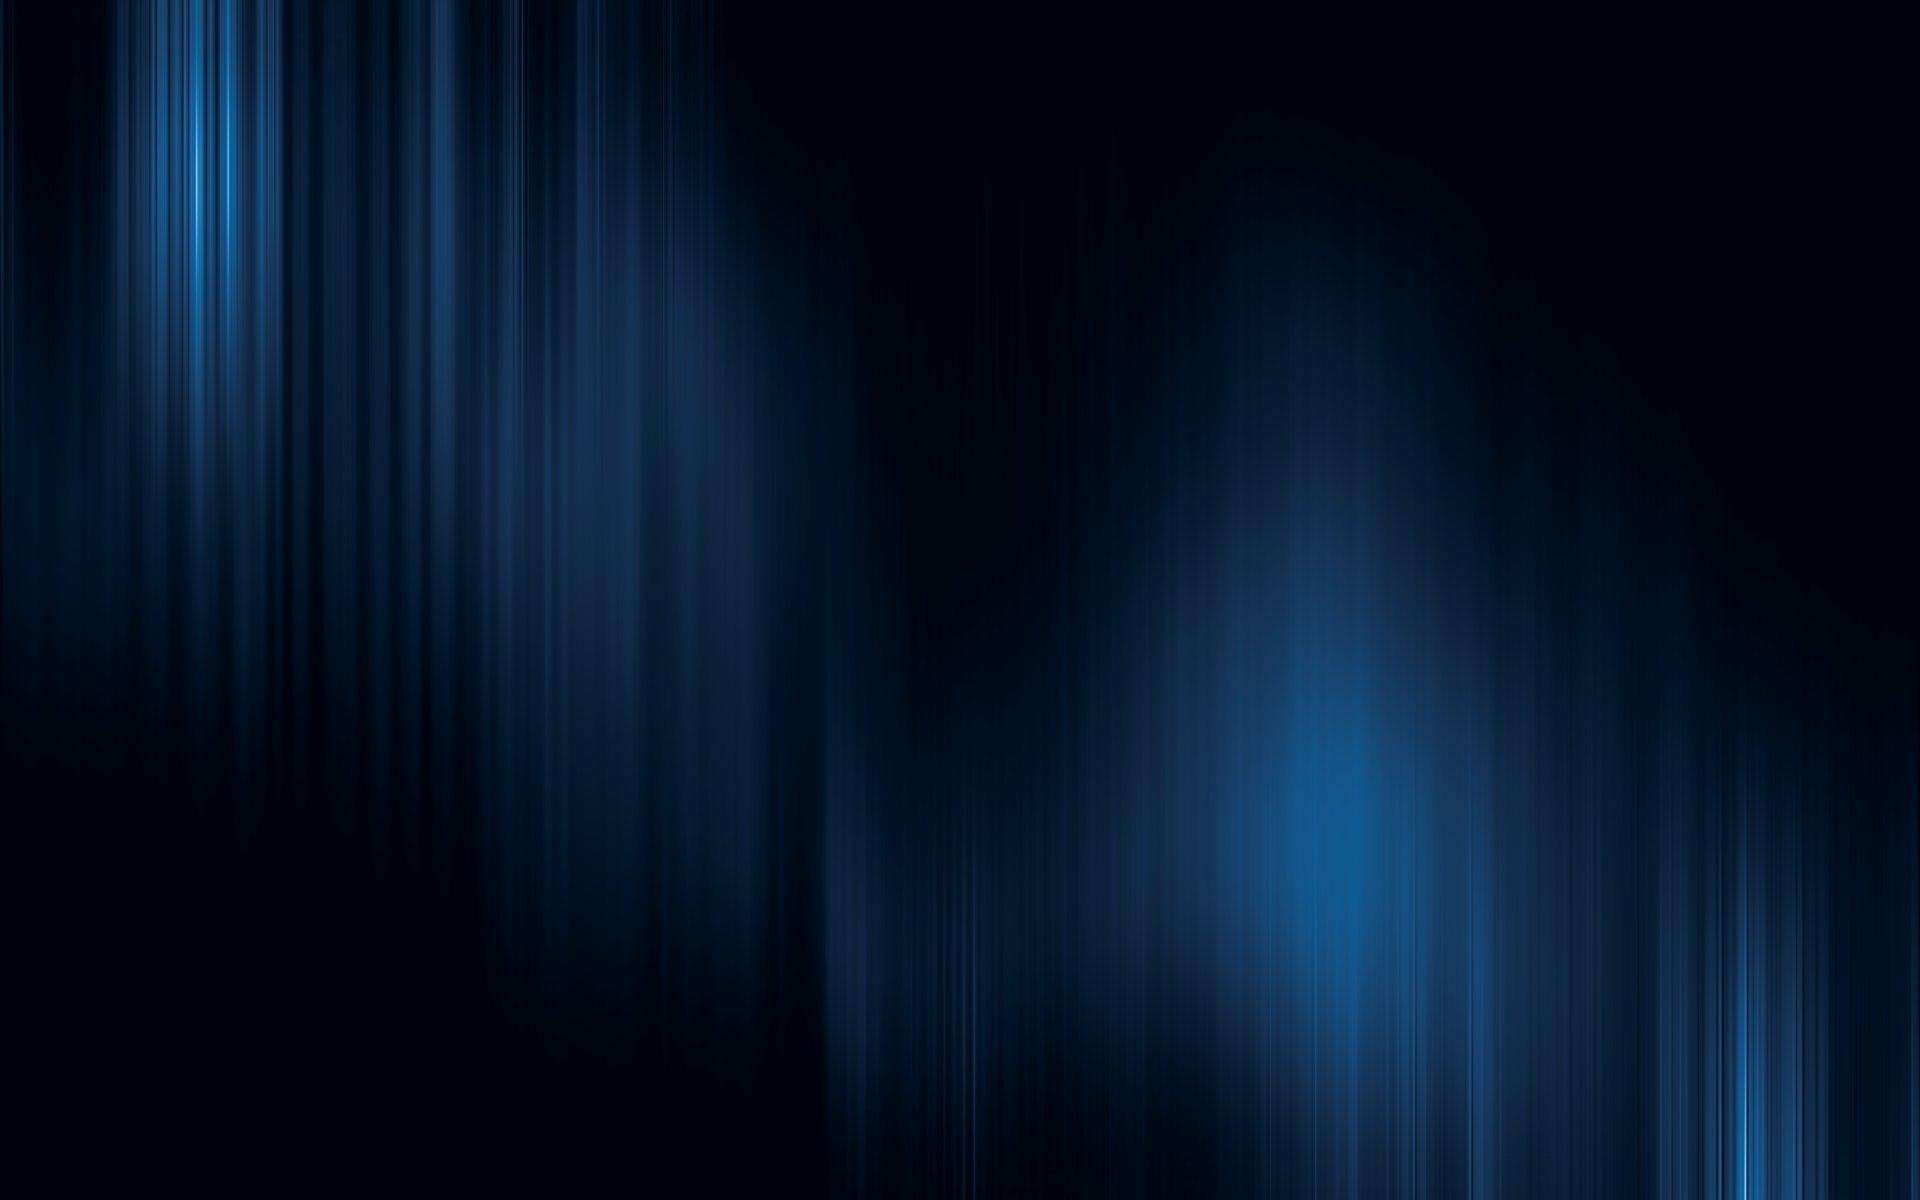 black-and-blue-wallpaper-free-download - wallpaper.wiki